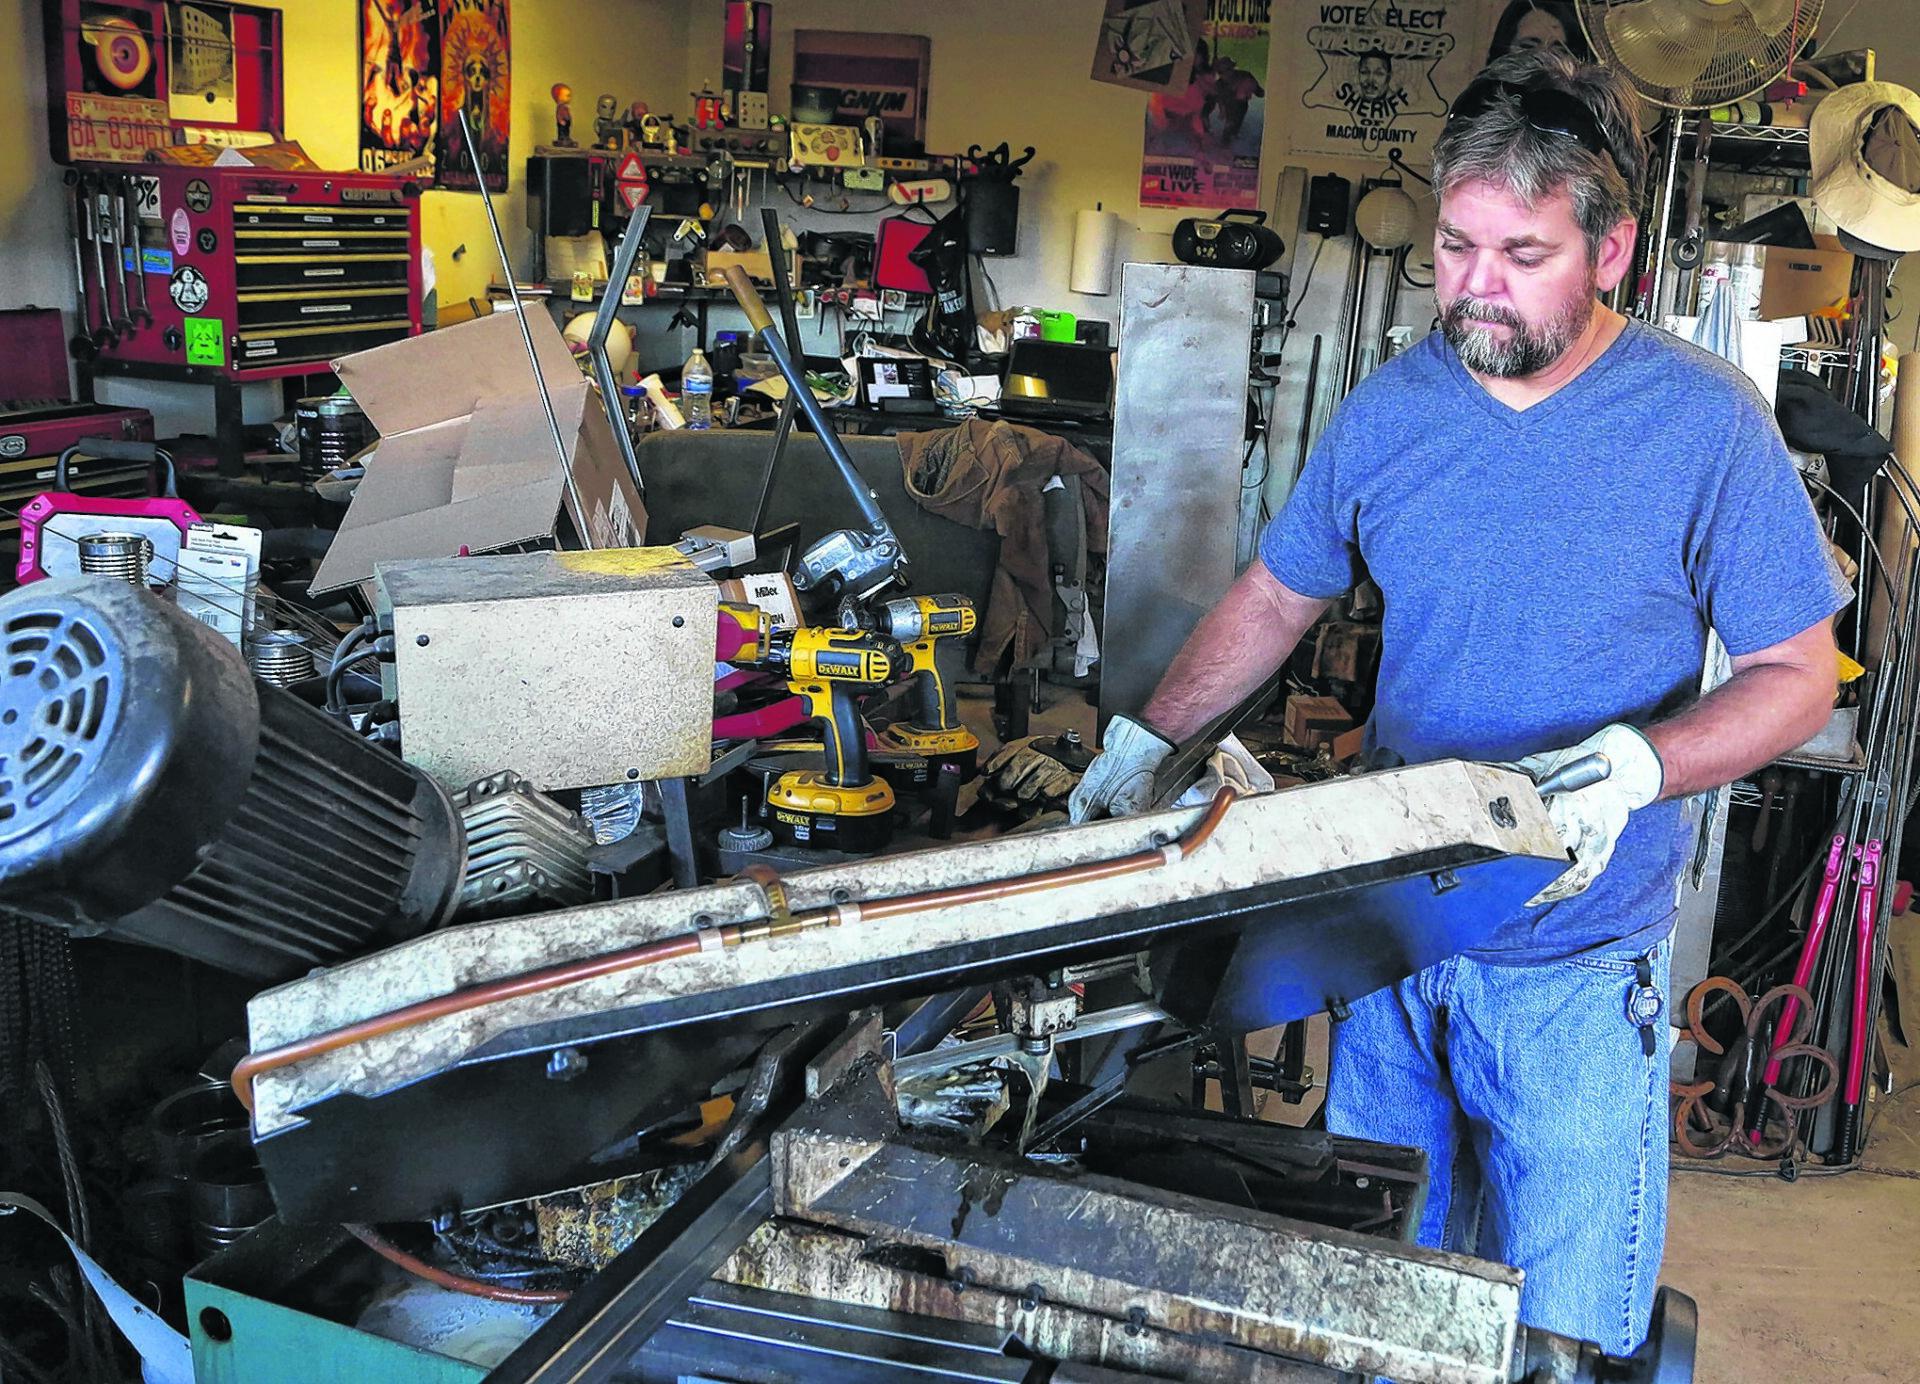 Weekend art fest draws TV tech-turned metal sculptor